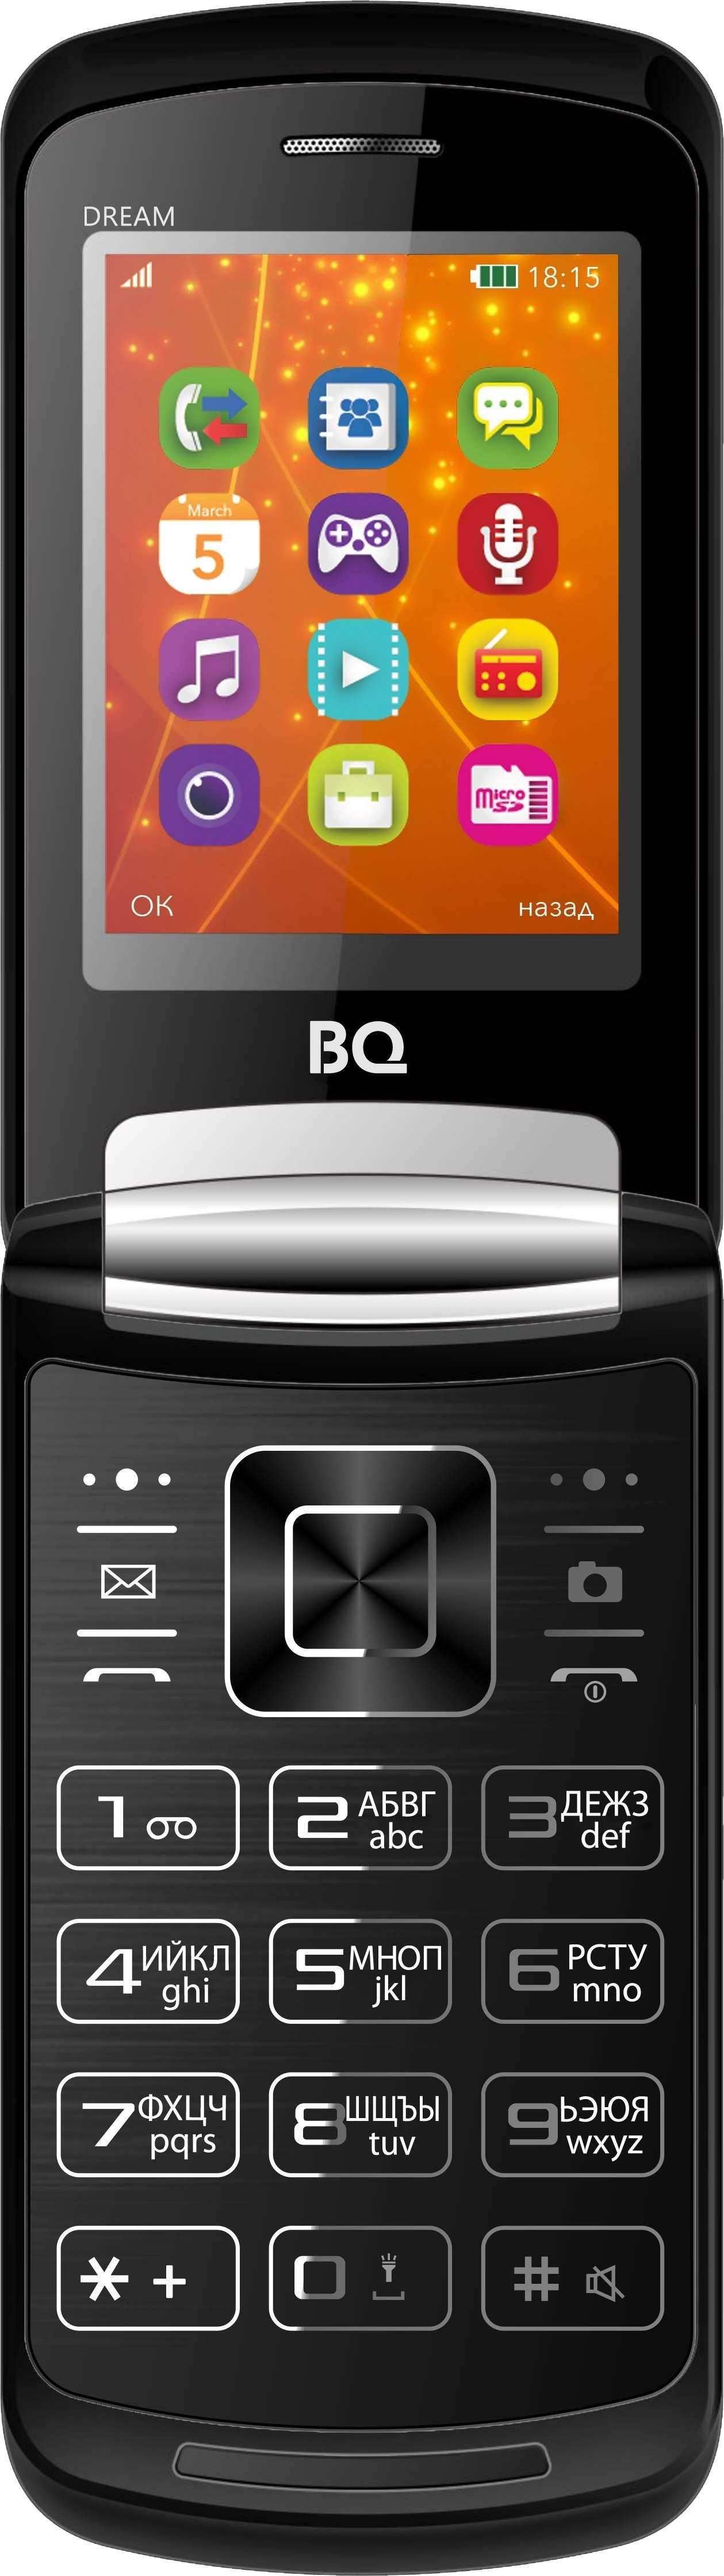 bq bqm-2000 baden - baden инструкция